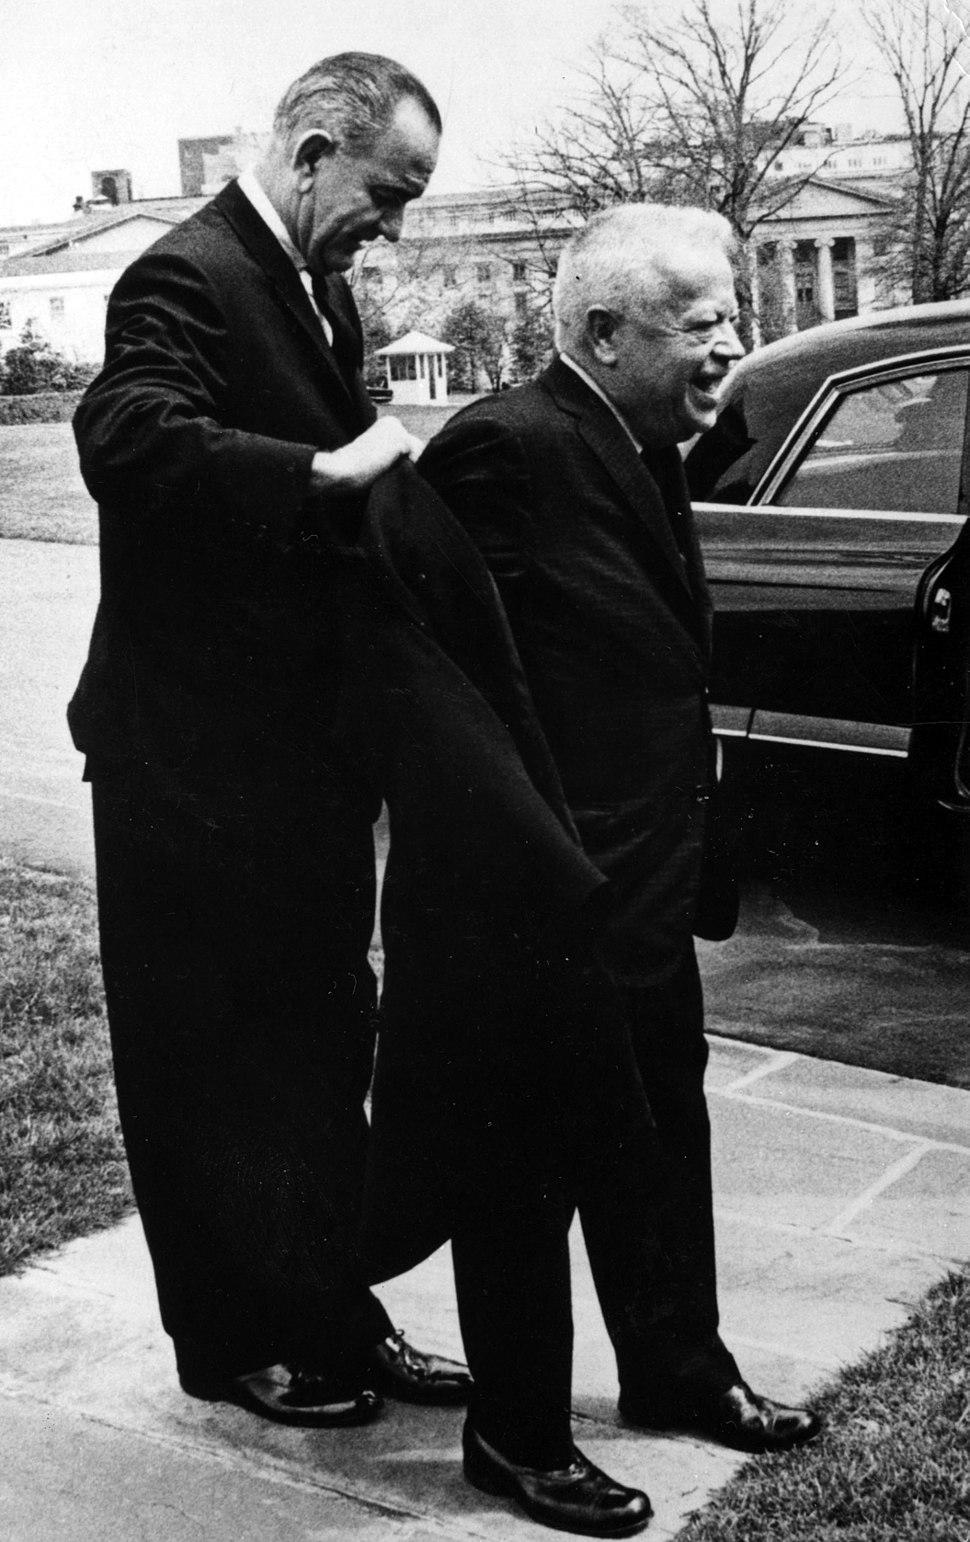 Lyndon B. Johnson helps David Dubinsky put on his coat.